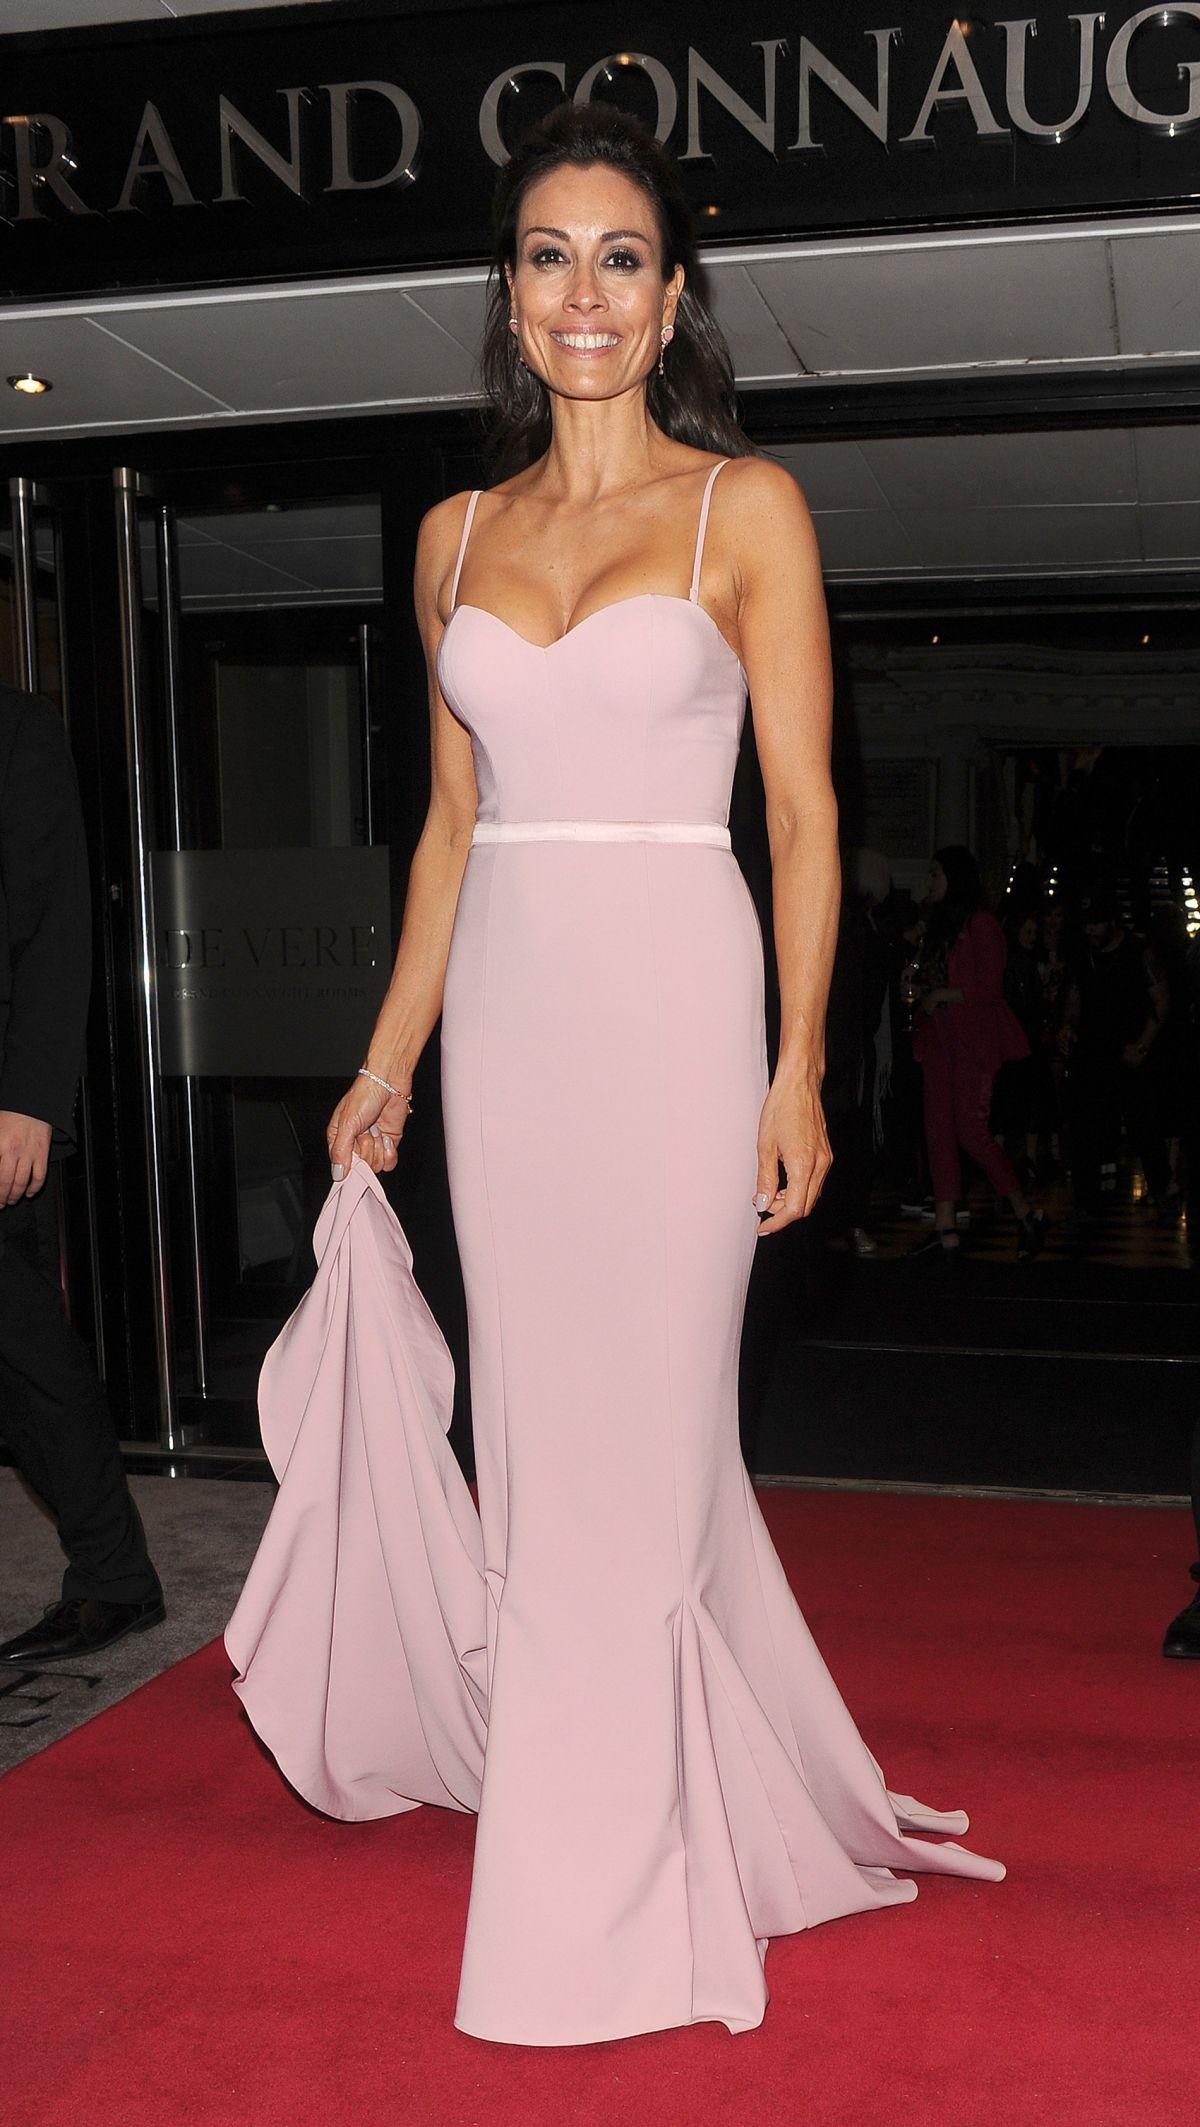 MELANIE SYKES at British LGBT Awards in London 05/12/2017